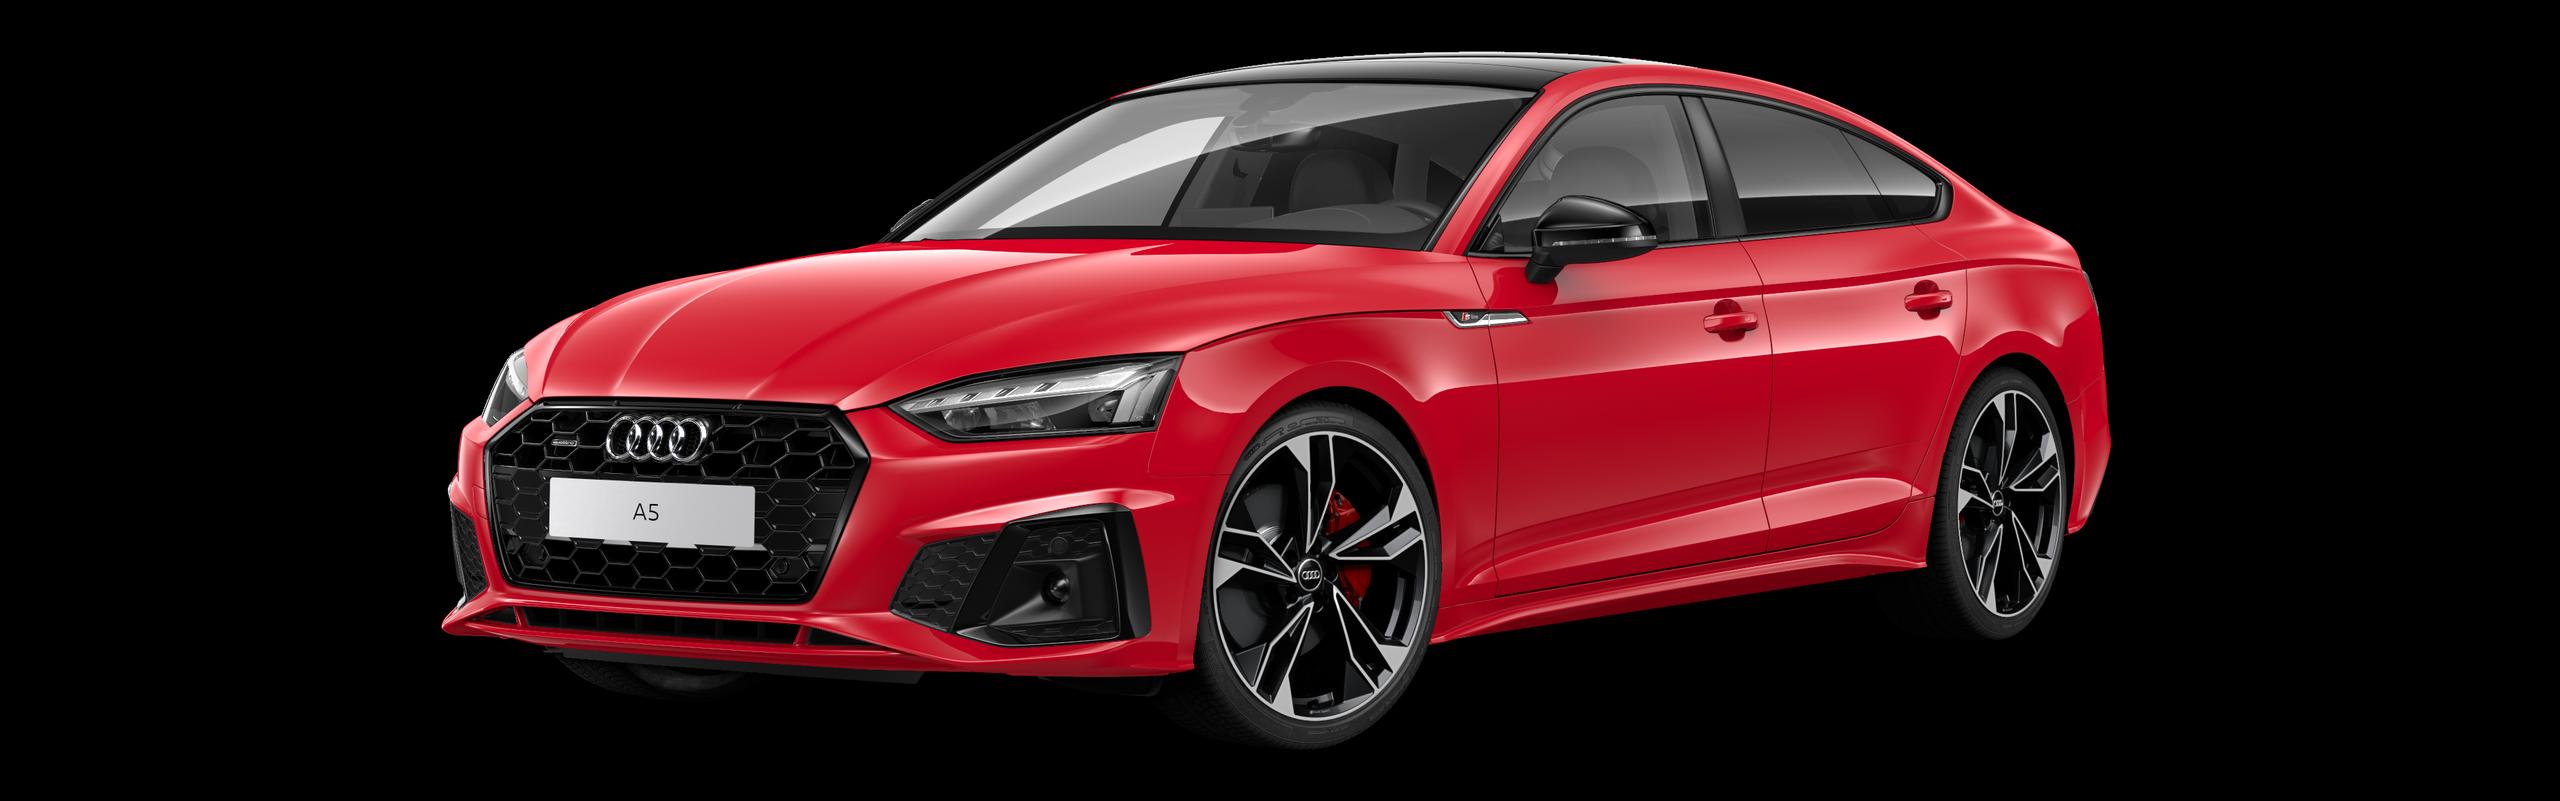 AUDI A5 SPORTBACK 45 TFSI QUATTRO S-TRONIC S-LINE - červená Tango metalíza